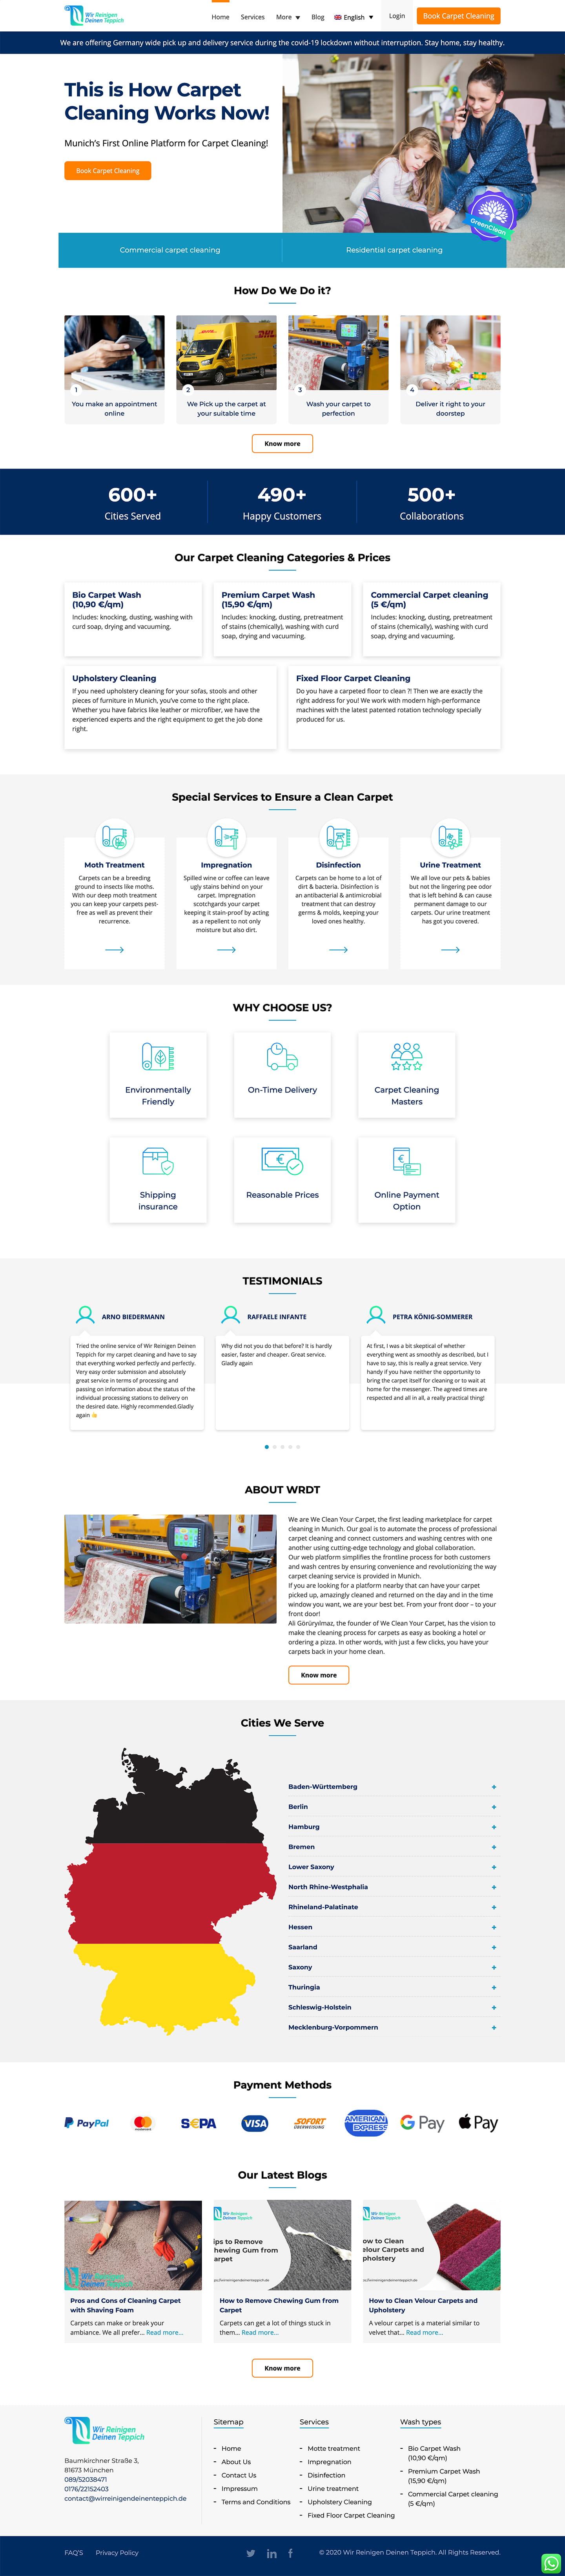 WRDT Home Page Desktop Version